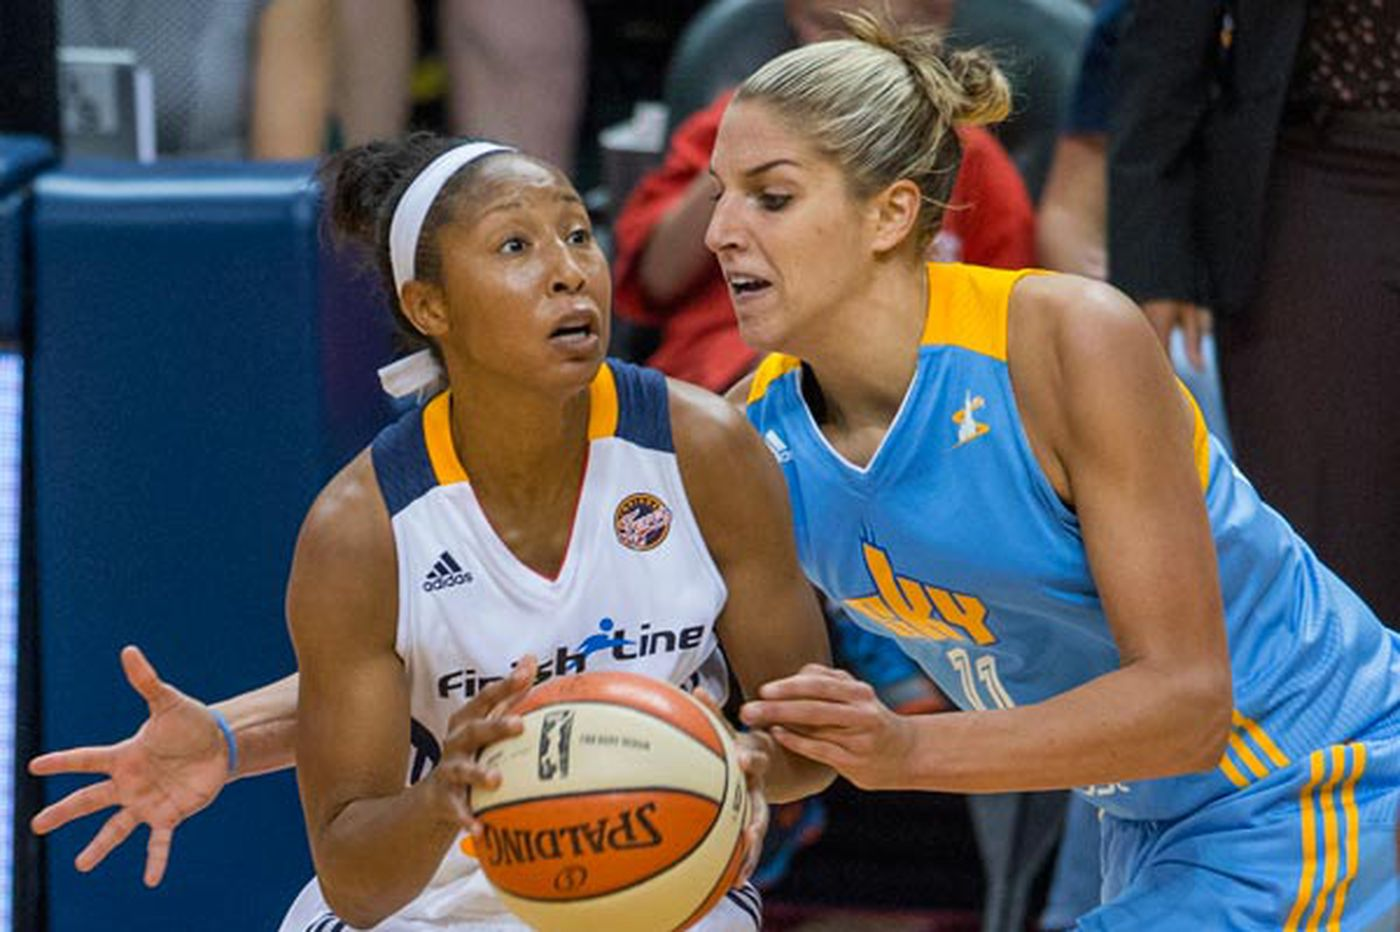 WNBA scoring leader Delle Donne seeks more respect for women's sports